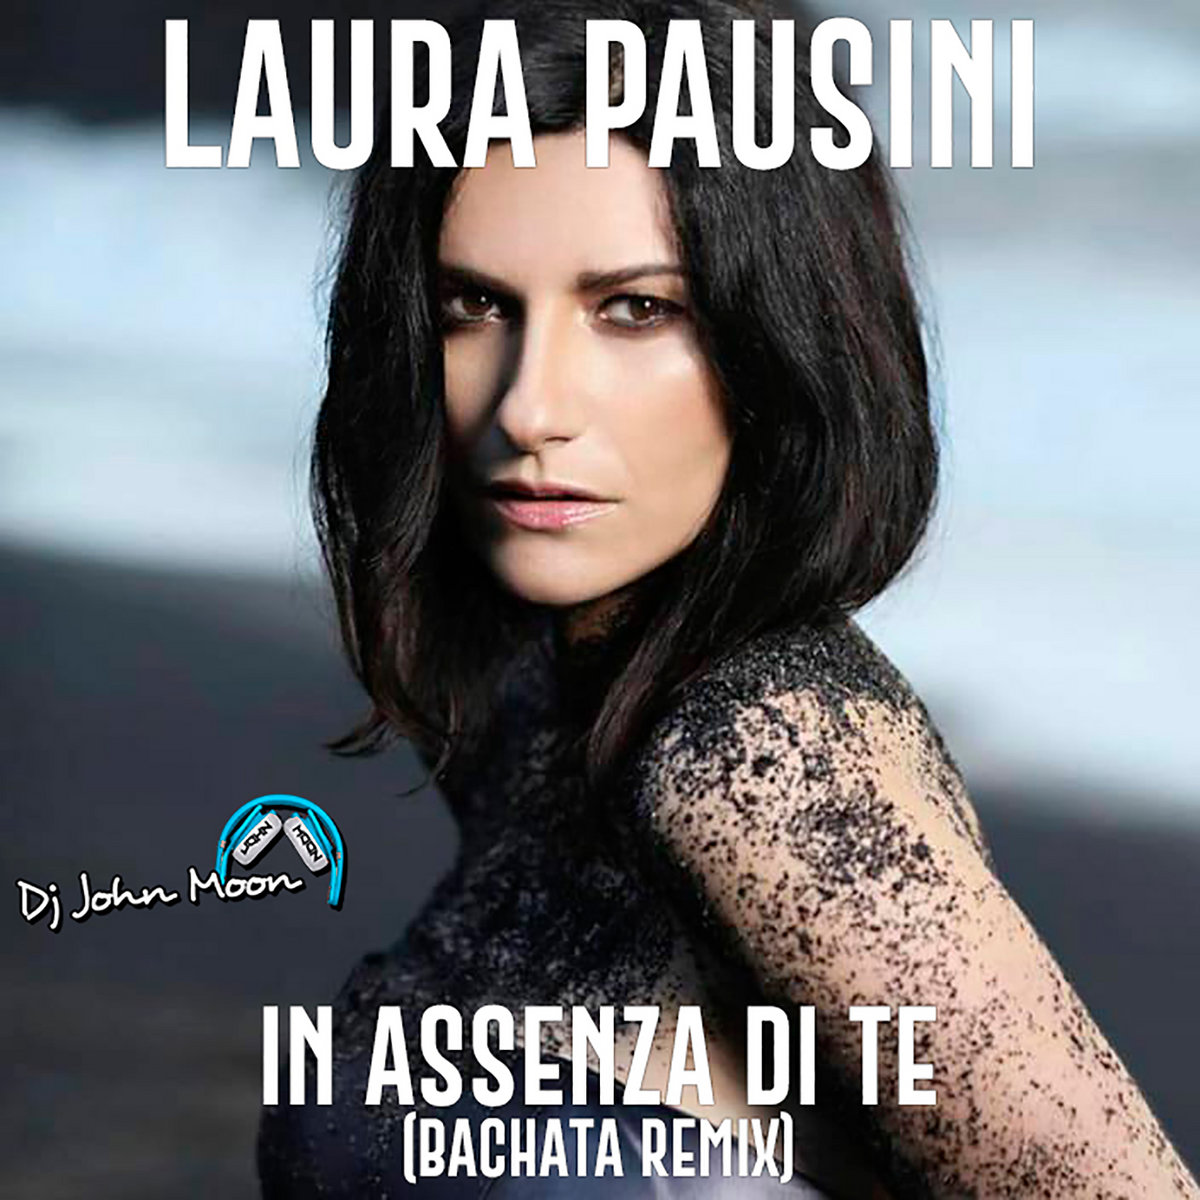 IN PAUSINI ASSENZA MP3 TÉLÉCHARGER LAURA DI TE